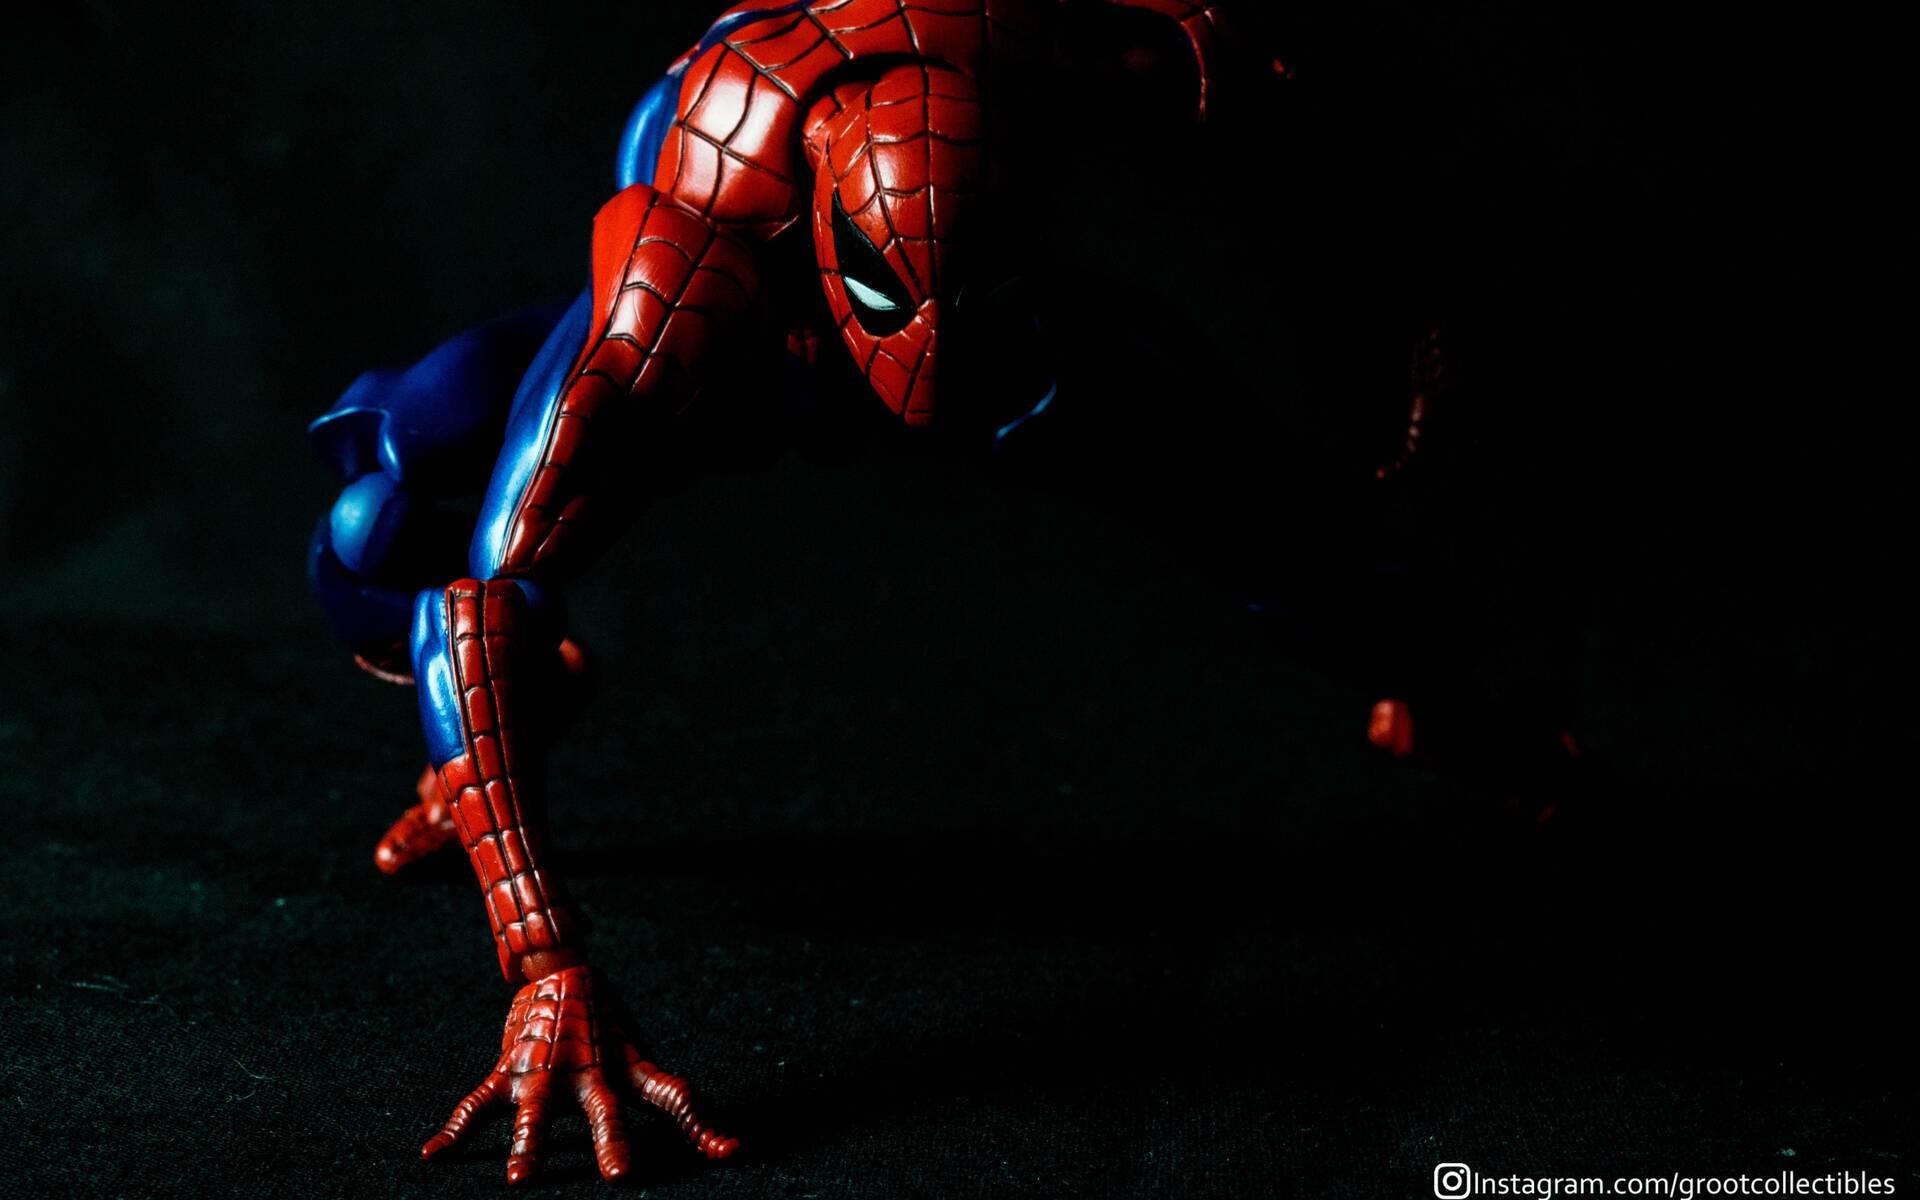 spiderman-web-of-shadows-ln.jpg